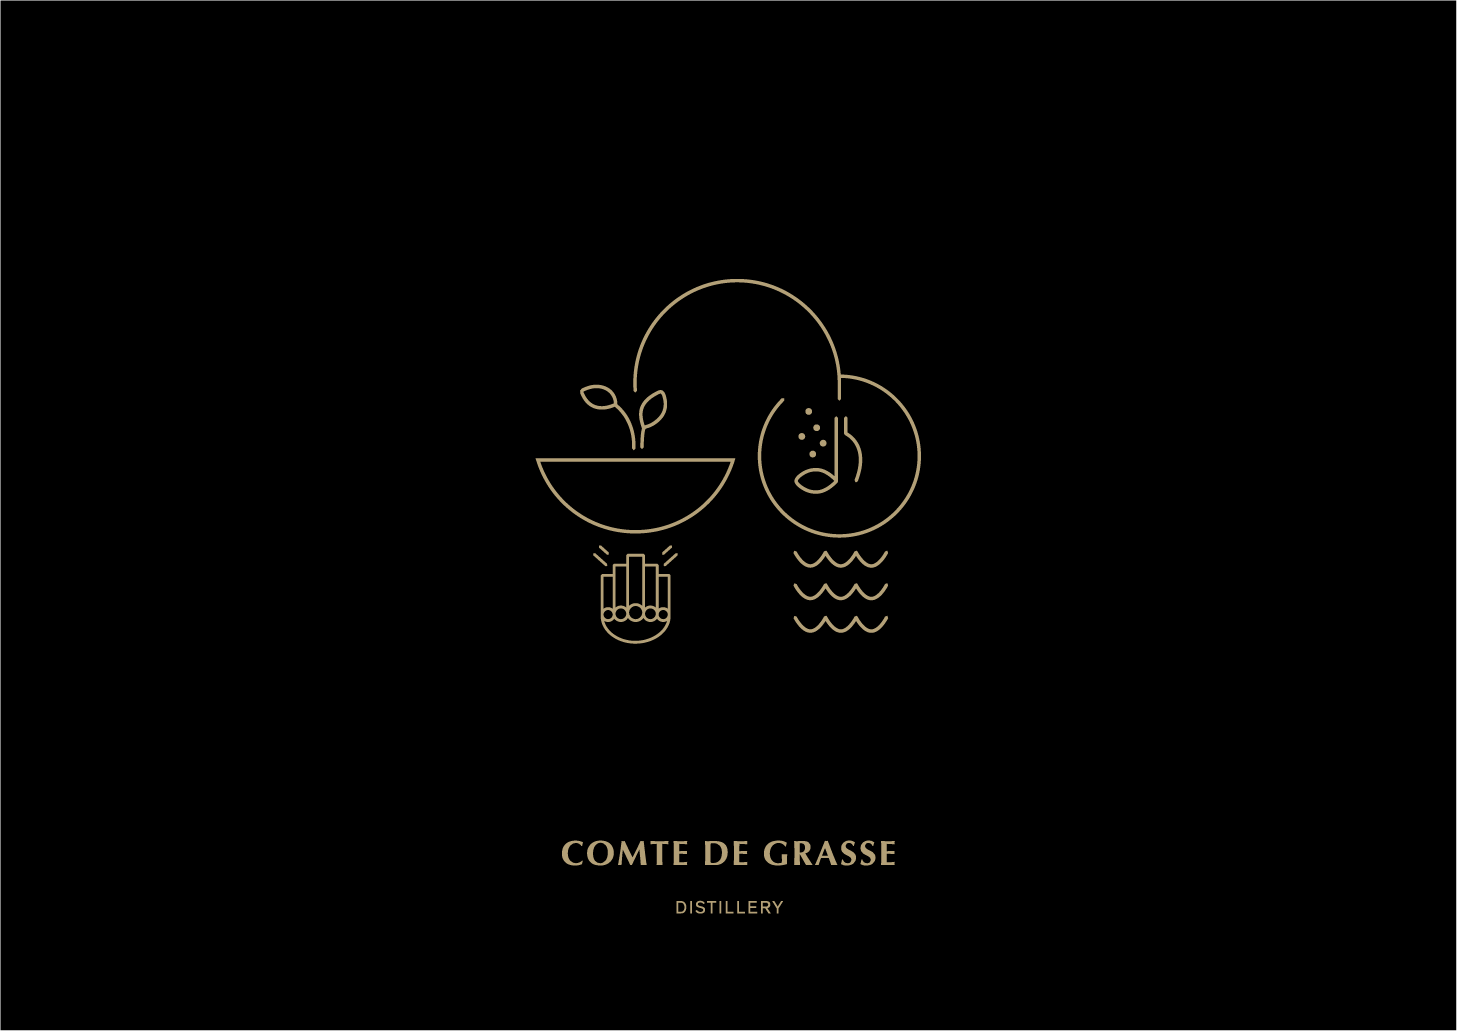 COMTE DE GRASSE-04.png